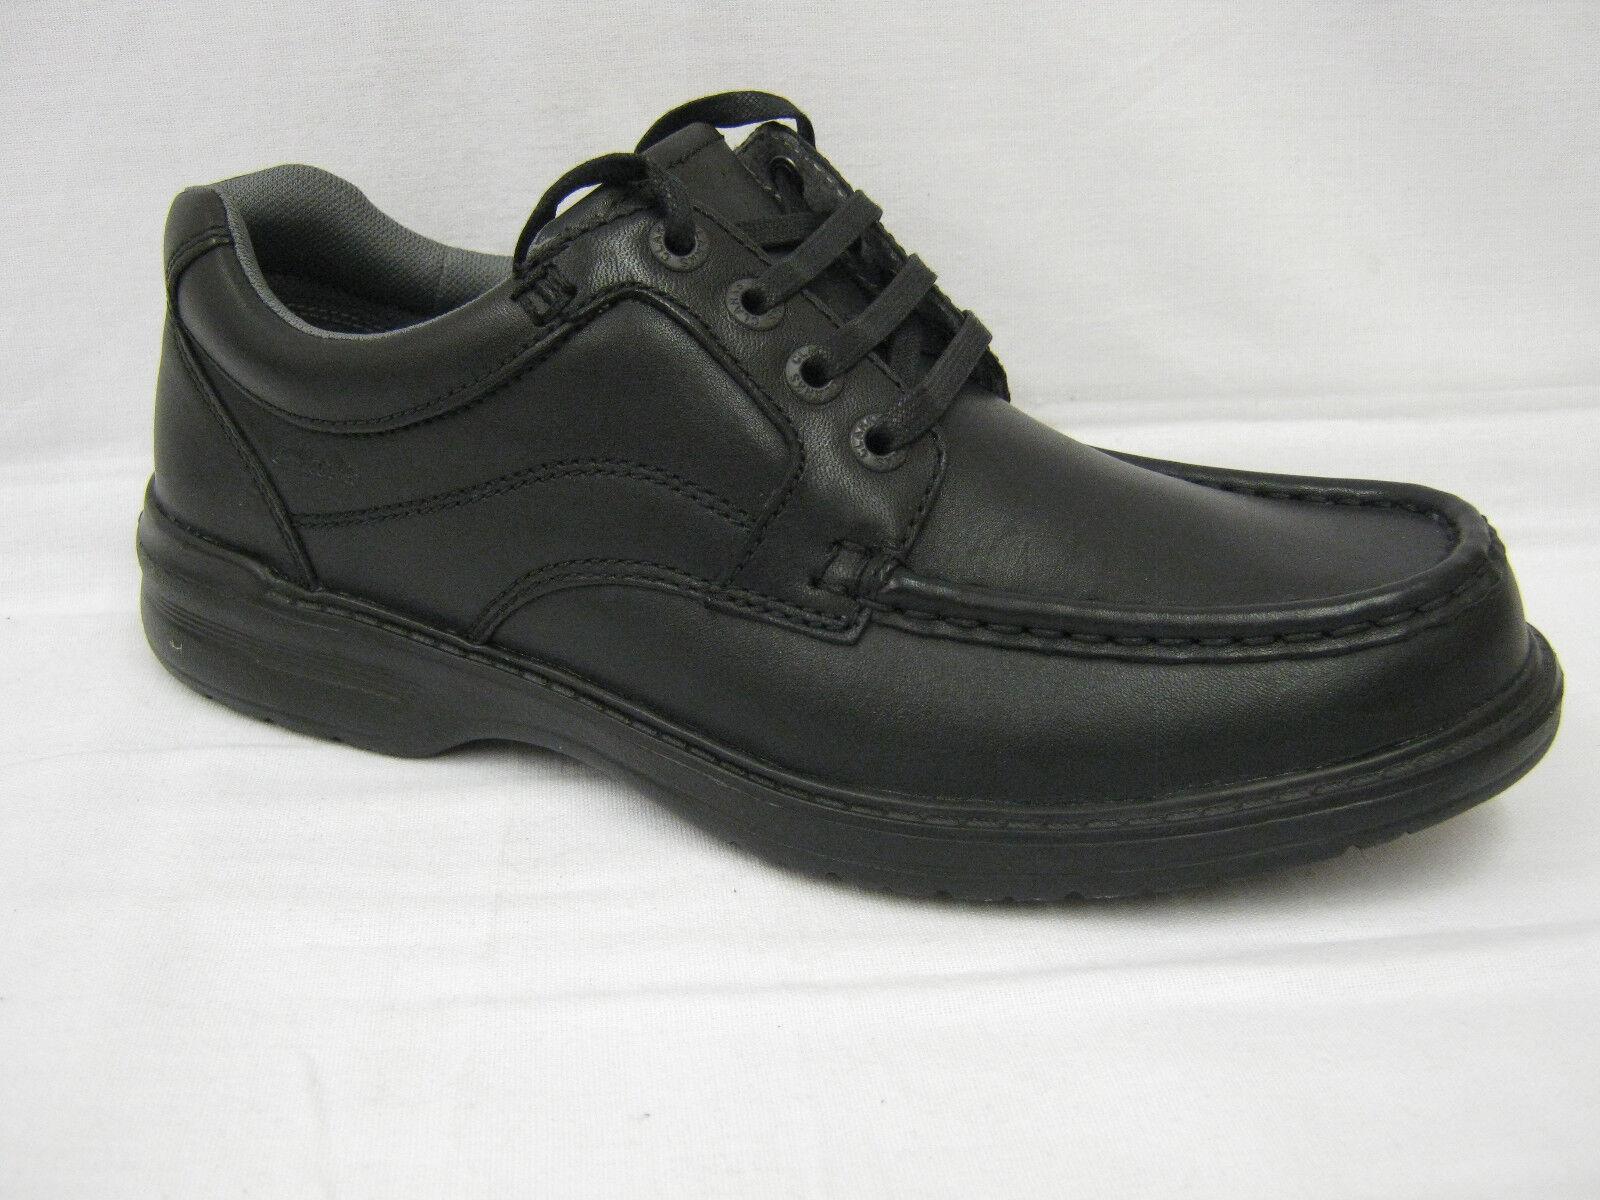 Scarpe casual da uomo  uomos Clarks Leather Lace up Shoe with Apron Front Keeler Walk